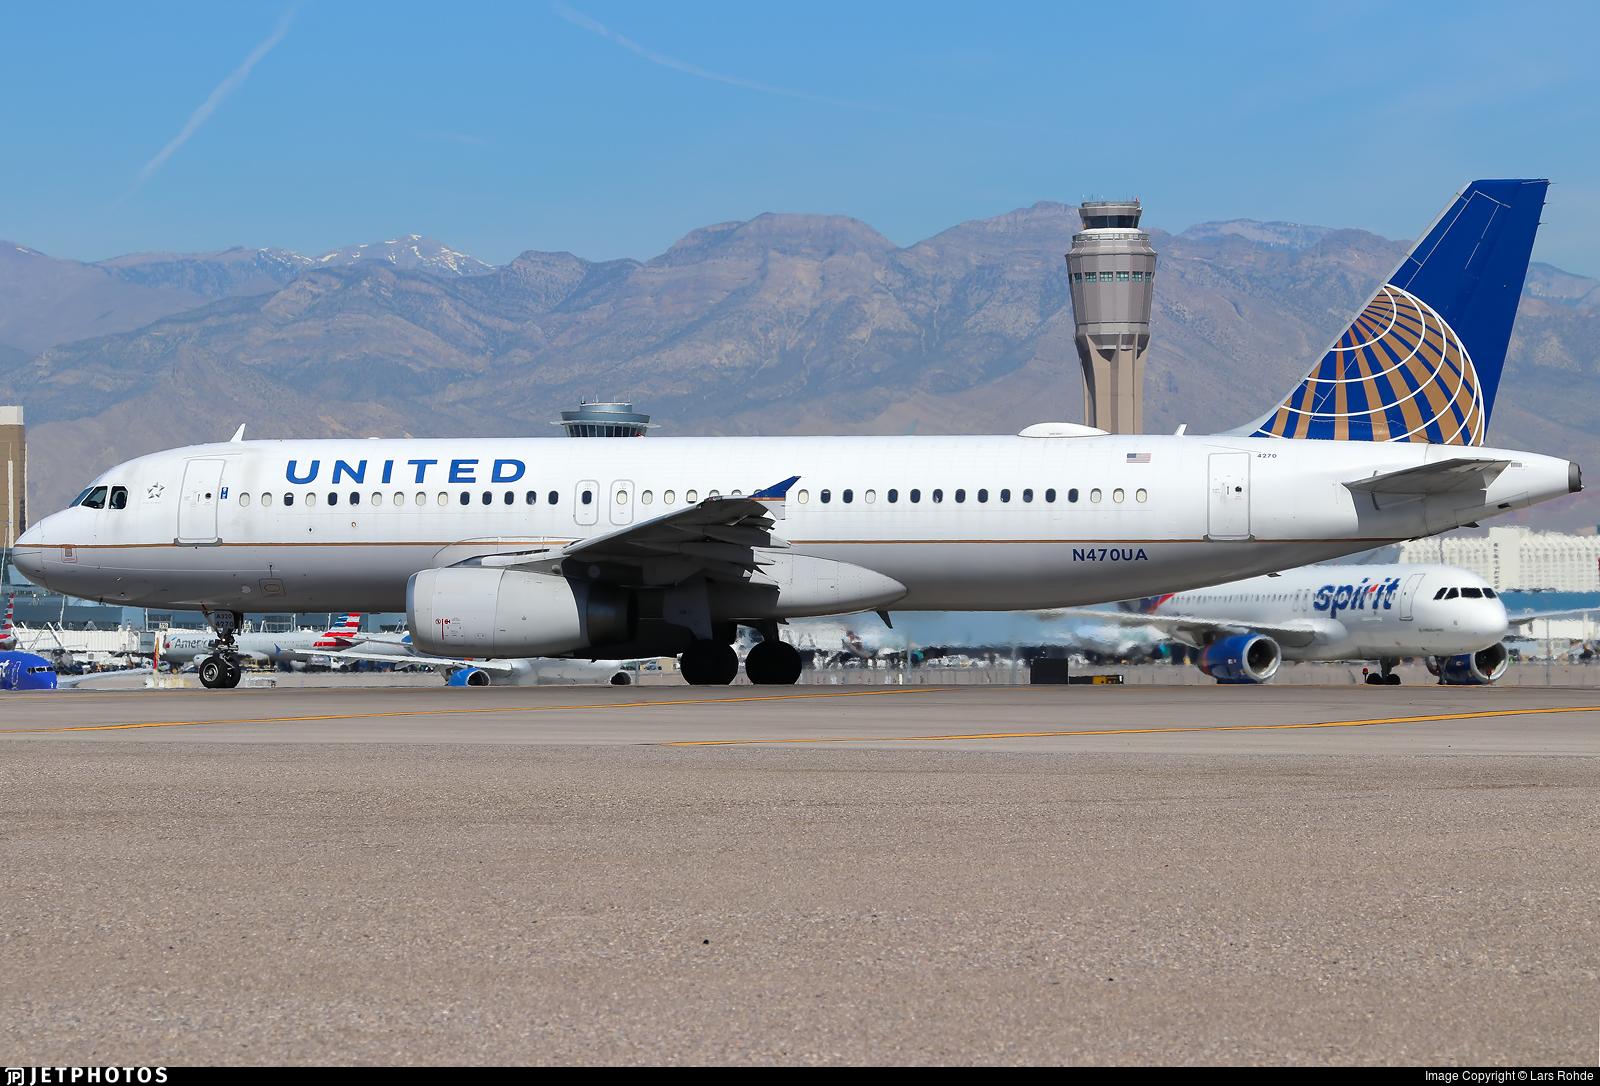 N470UA - Airbus A320-232 - United Airlines